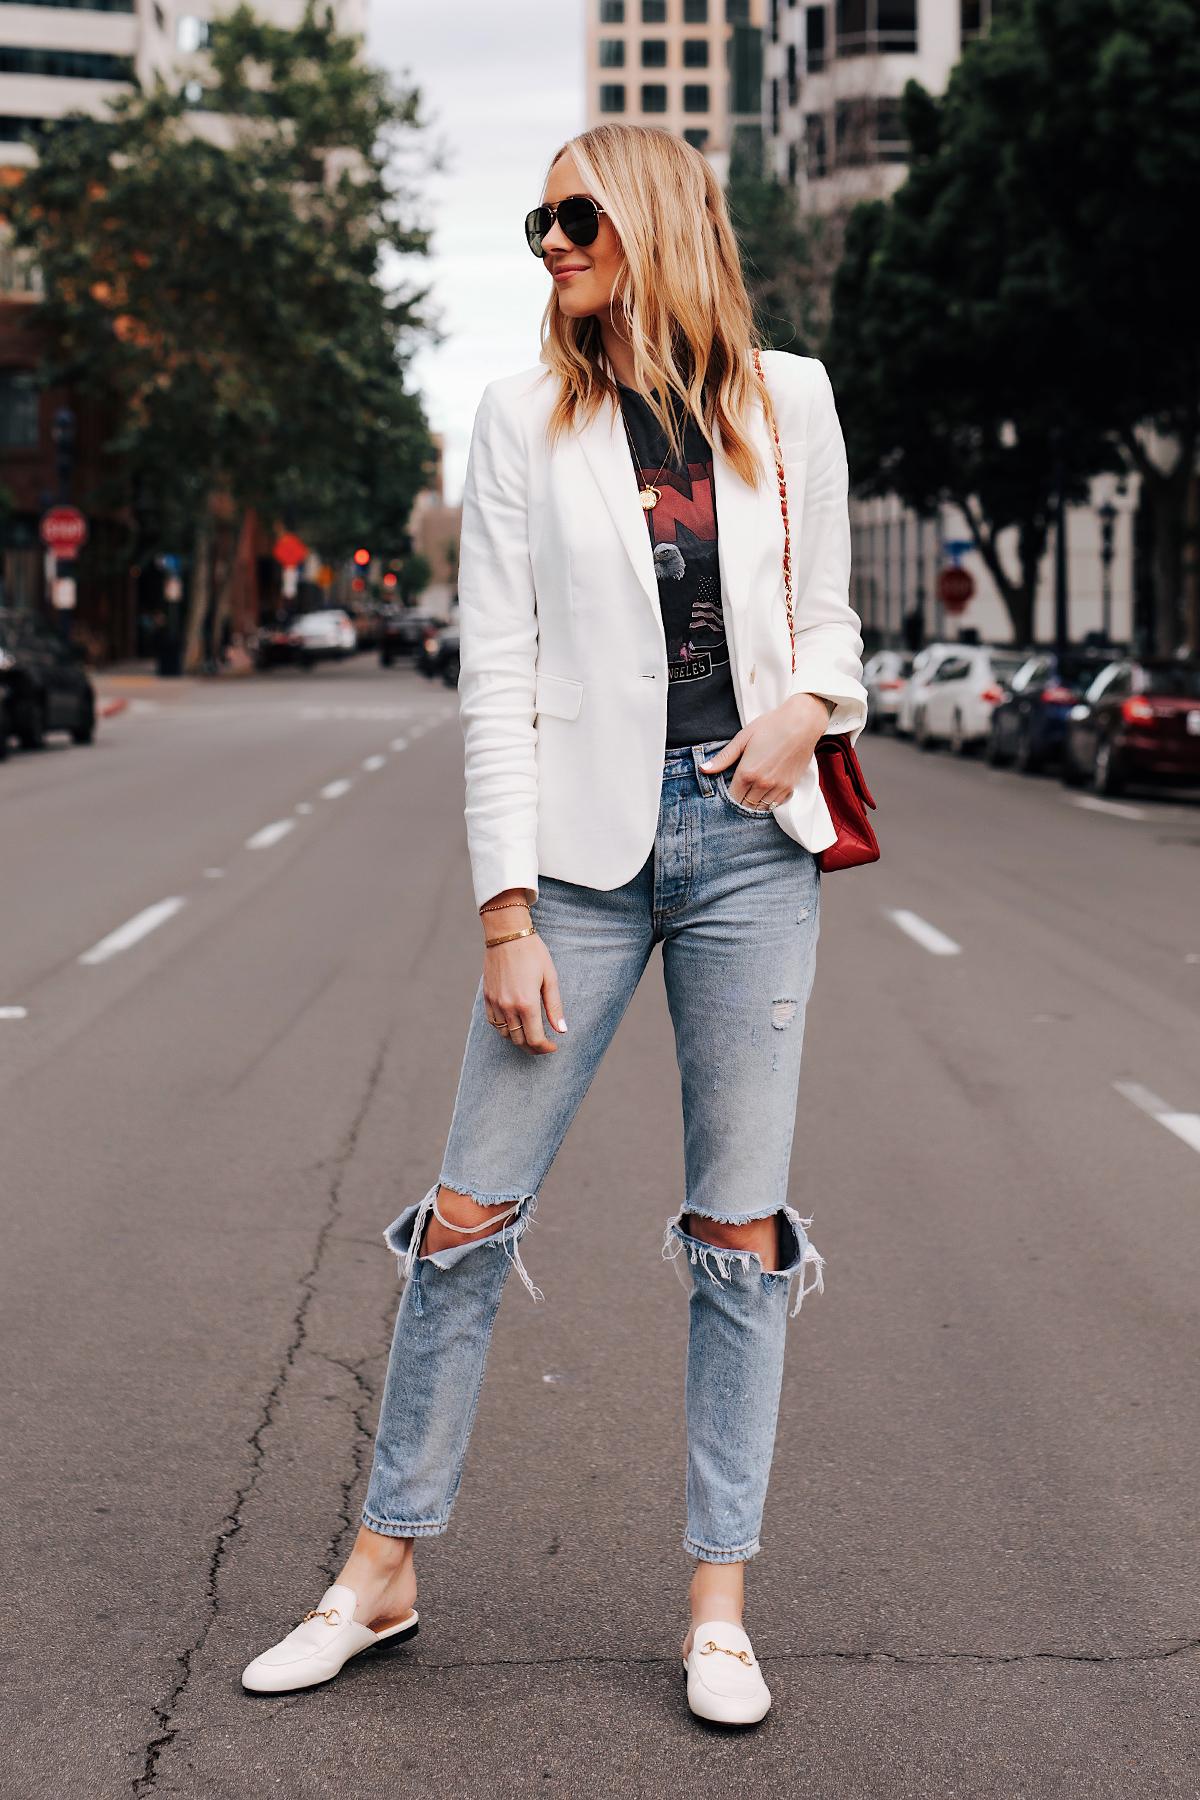 Blonde Woman Wearing White Blazer Anine Bing Graphic Tshirt Boyish Ripped Jeans Gucci Princetown White Mules Fashion Jackson San Diego Fashion Blogger Street Style